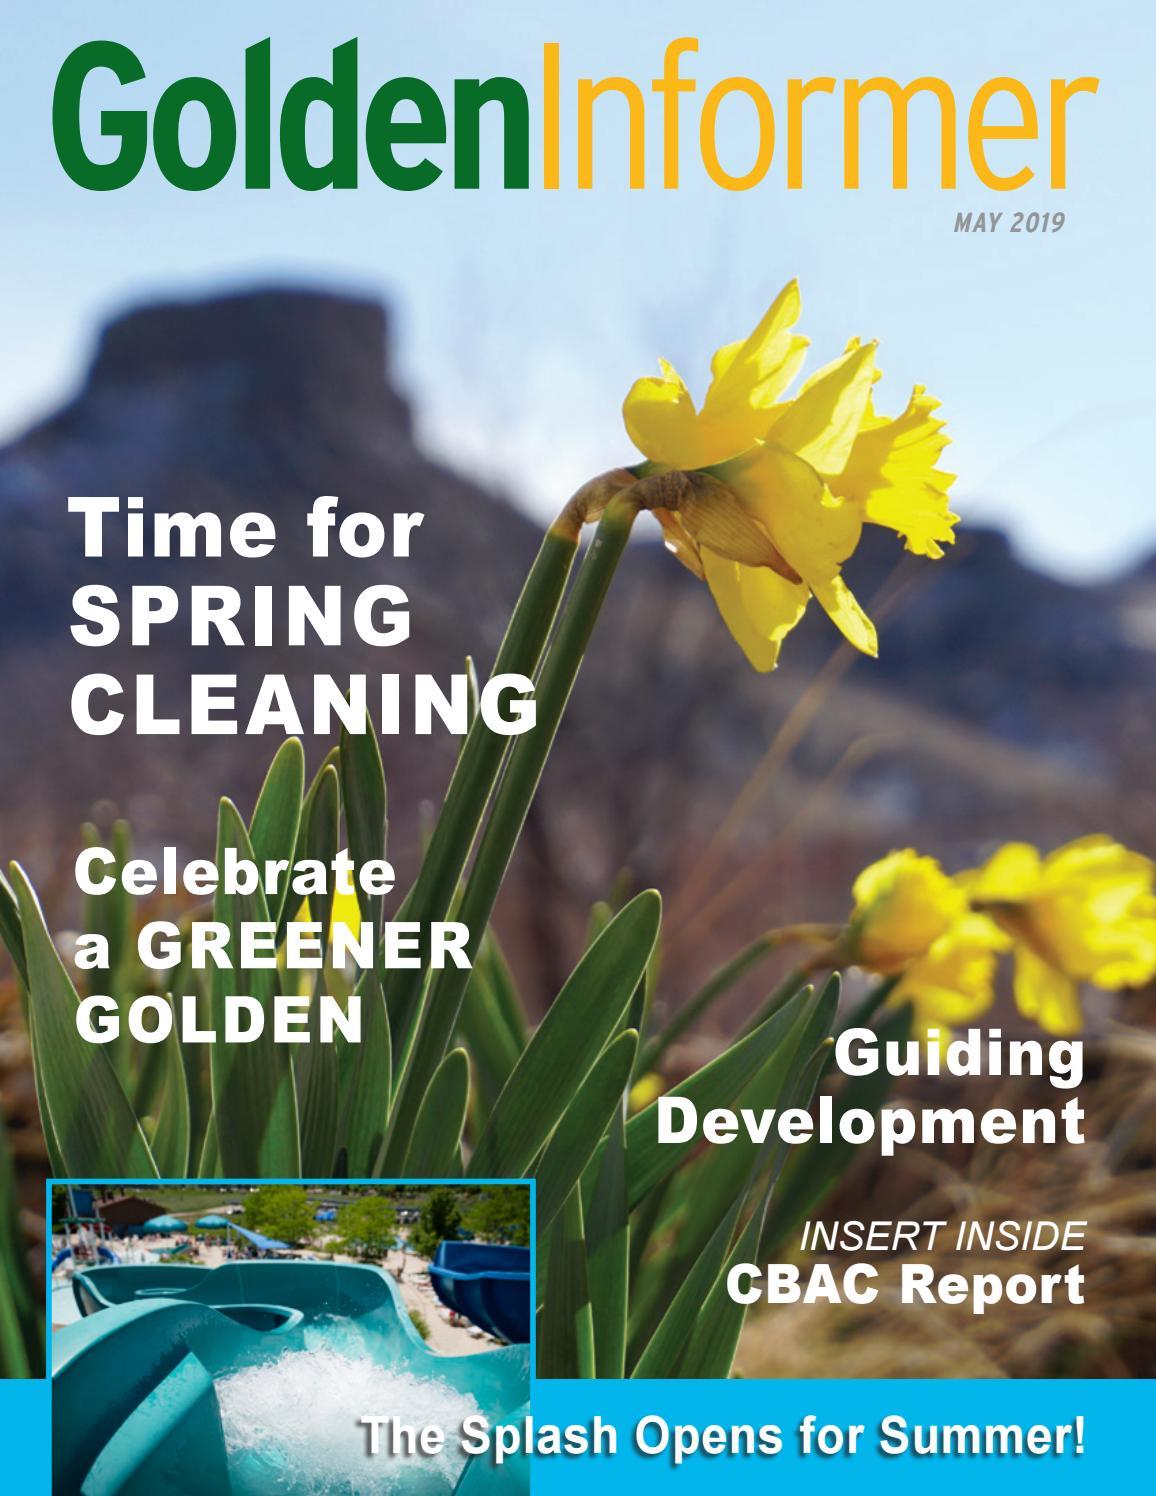 Golden Informer - May 2019